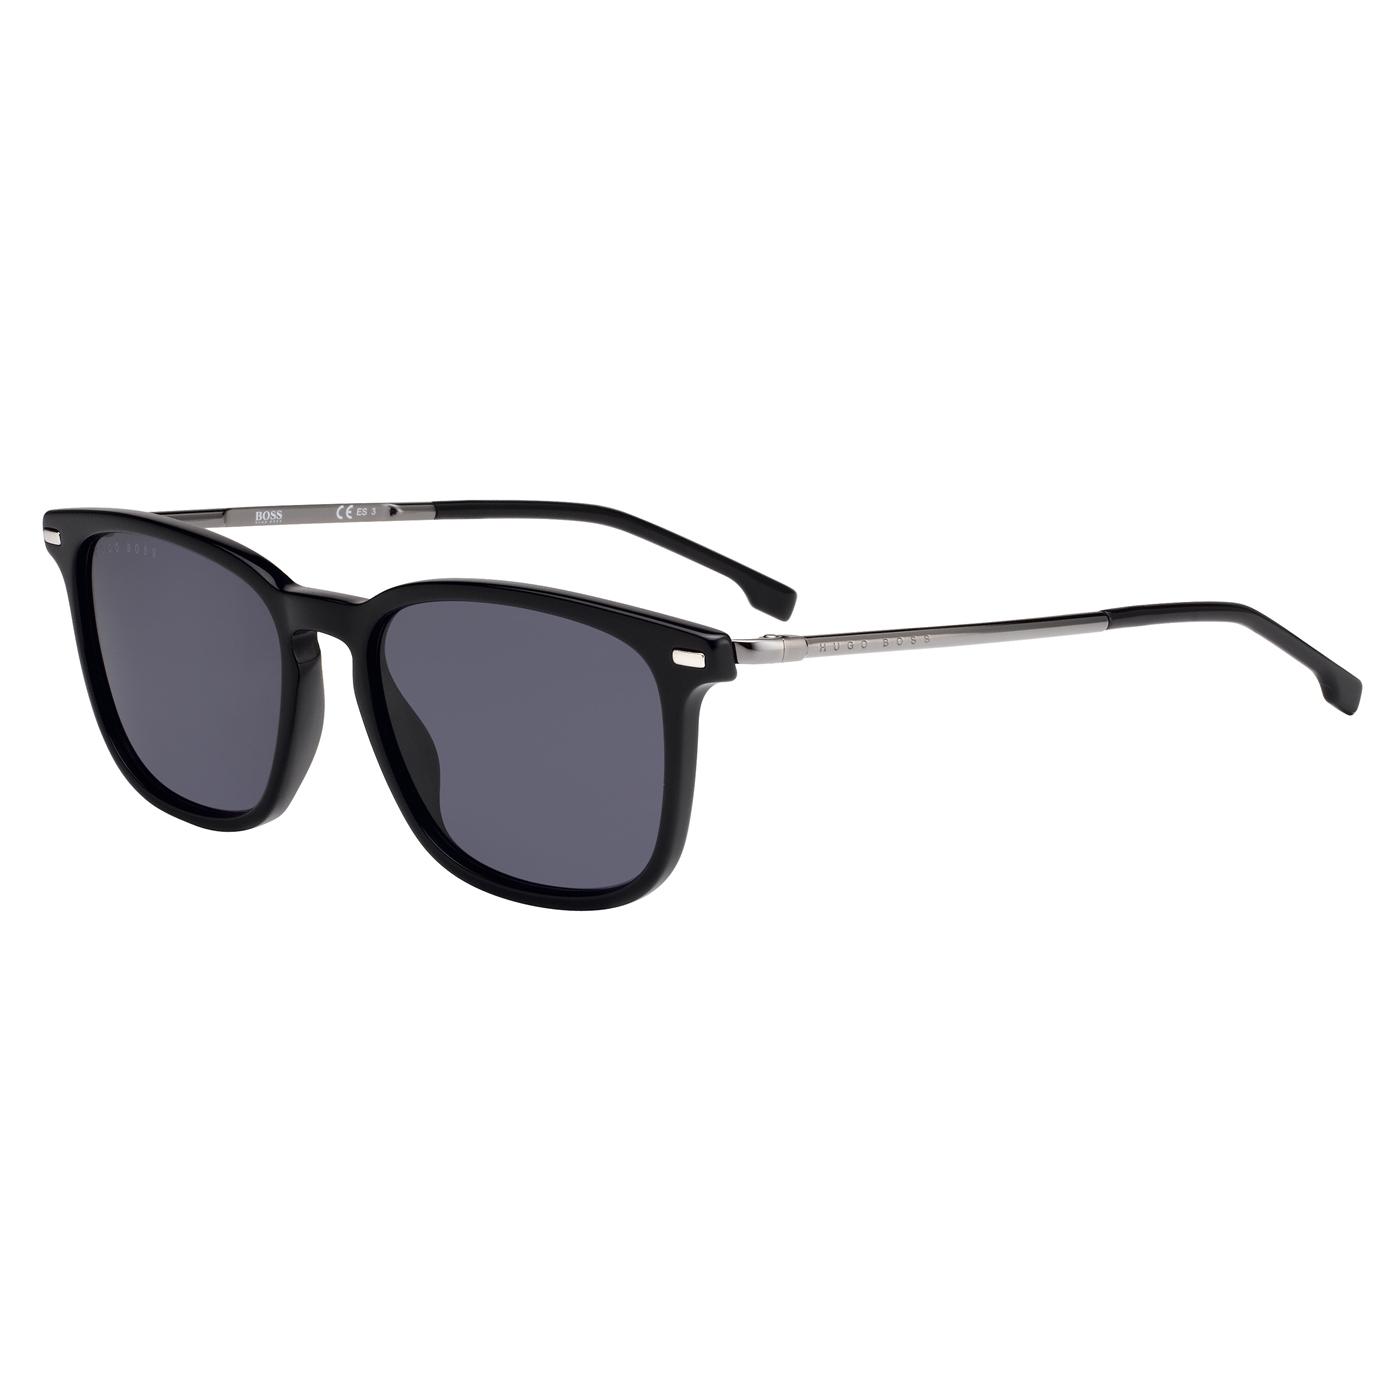 Bilde av Boss Black Sunglasses BOSS 1020S 807 54 IR